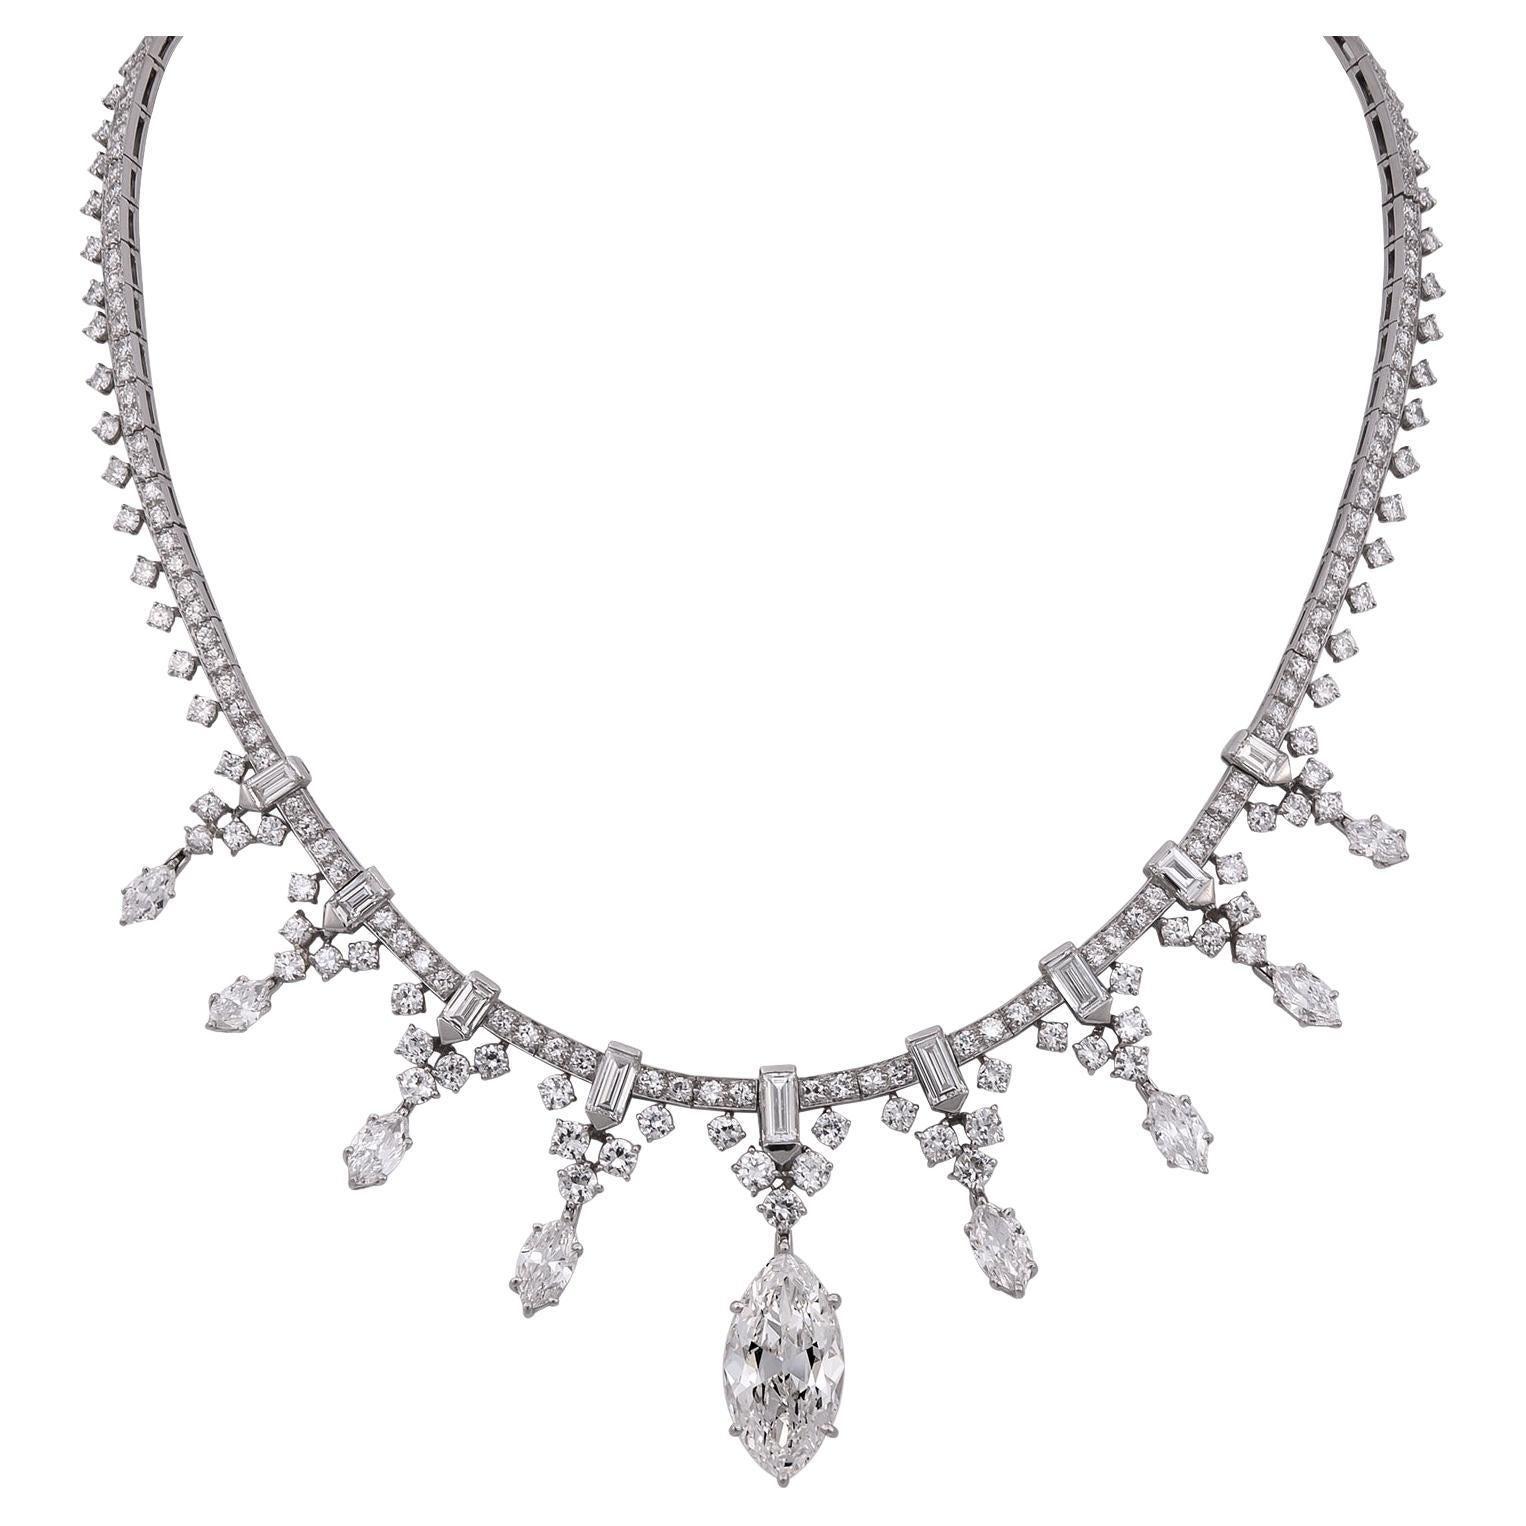 1950s Van Cleef & Arpels Diamond Platinum Necklace